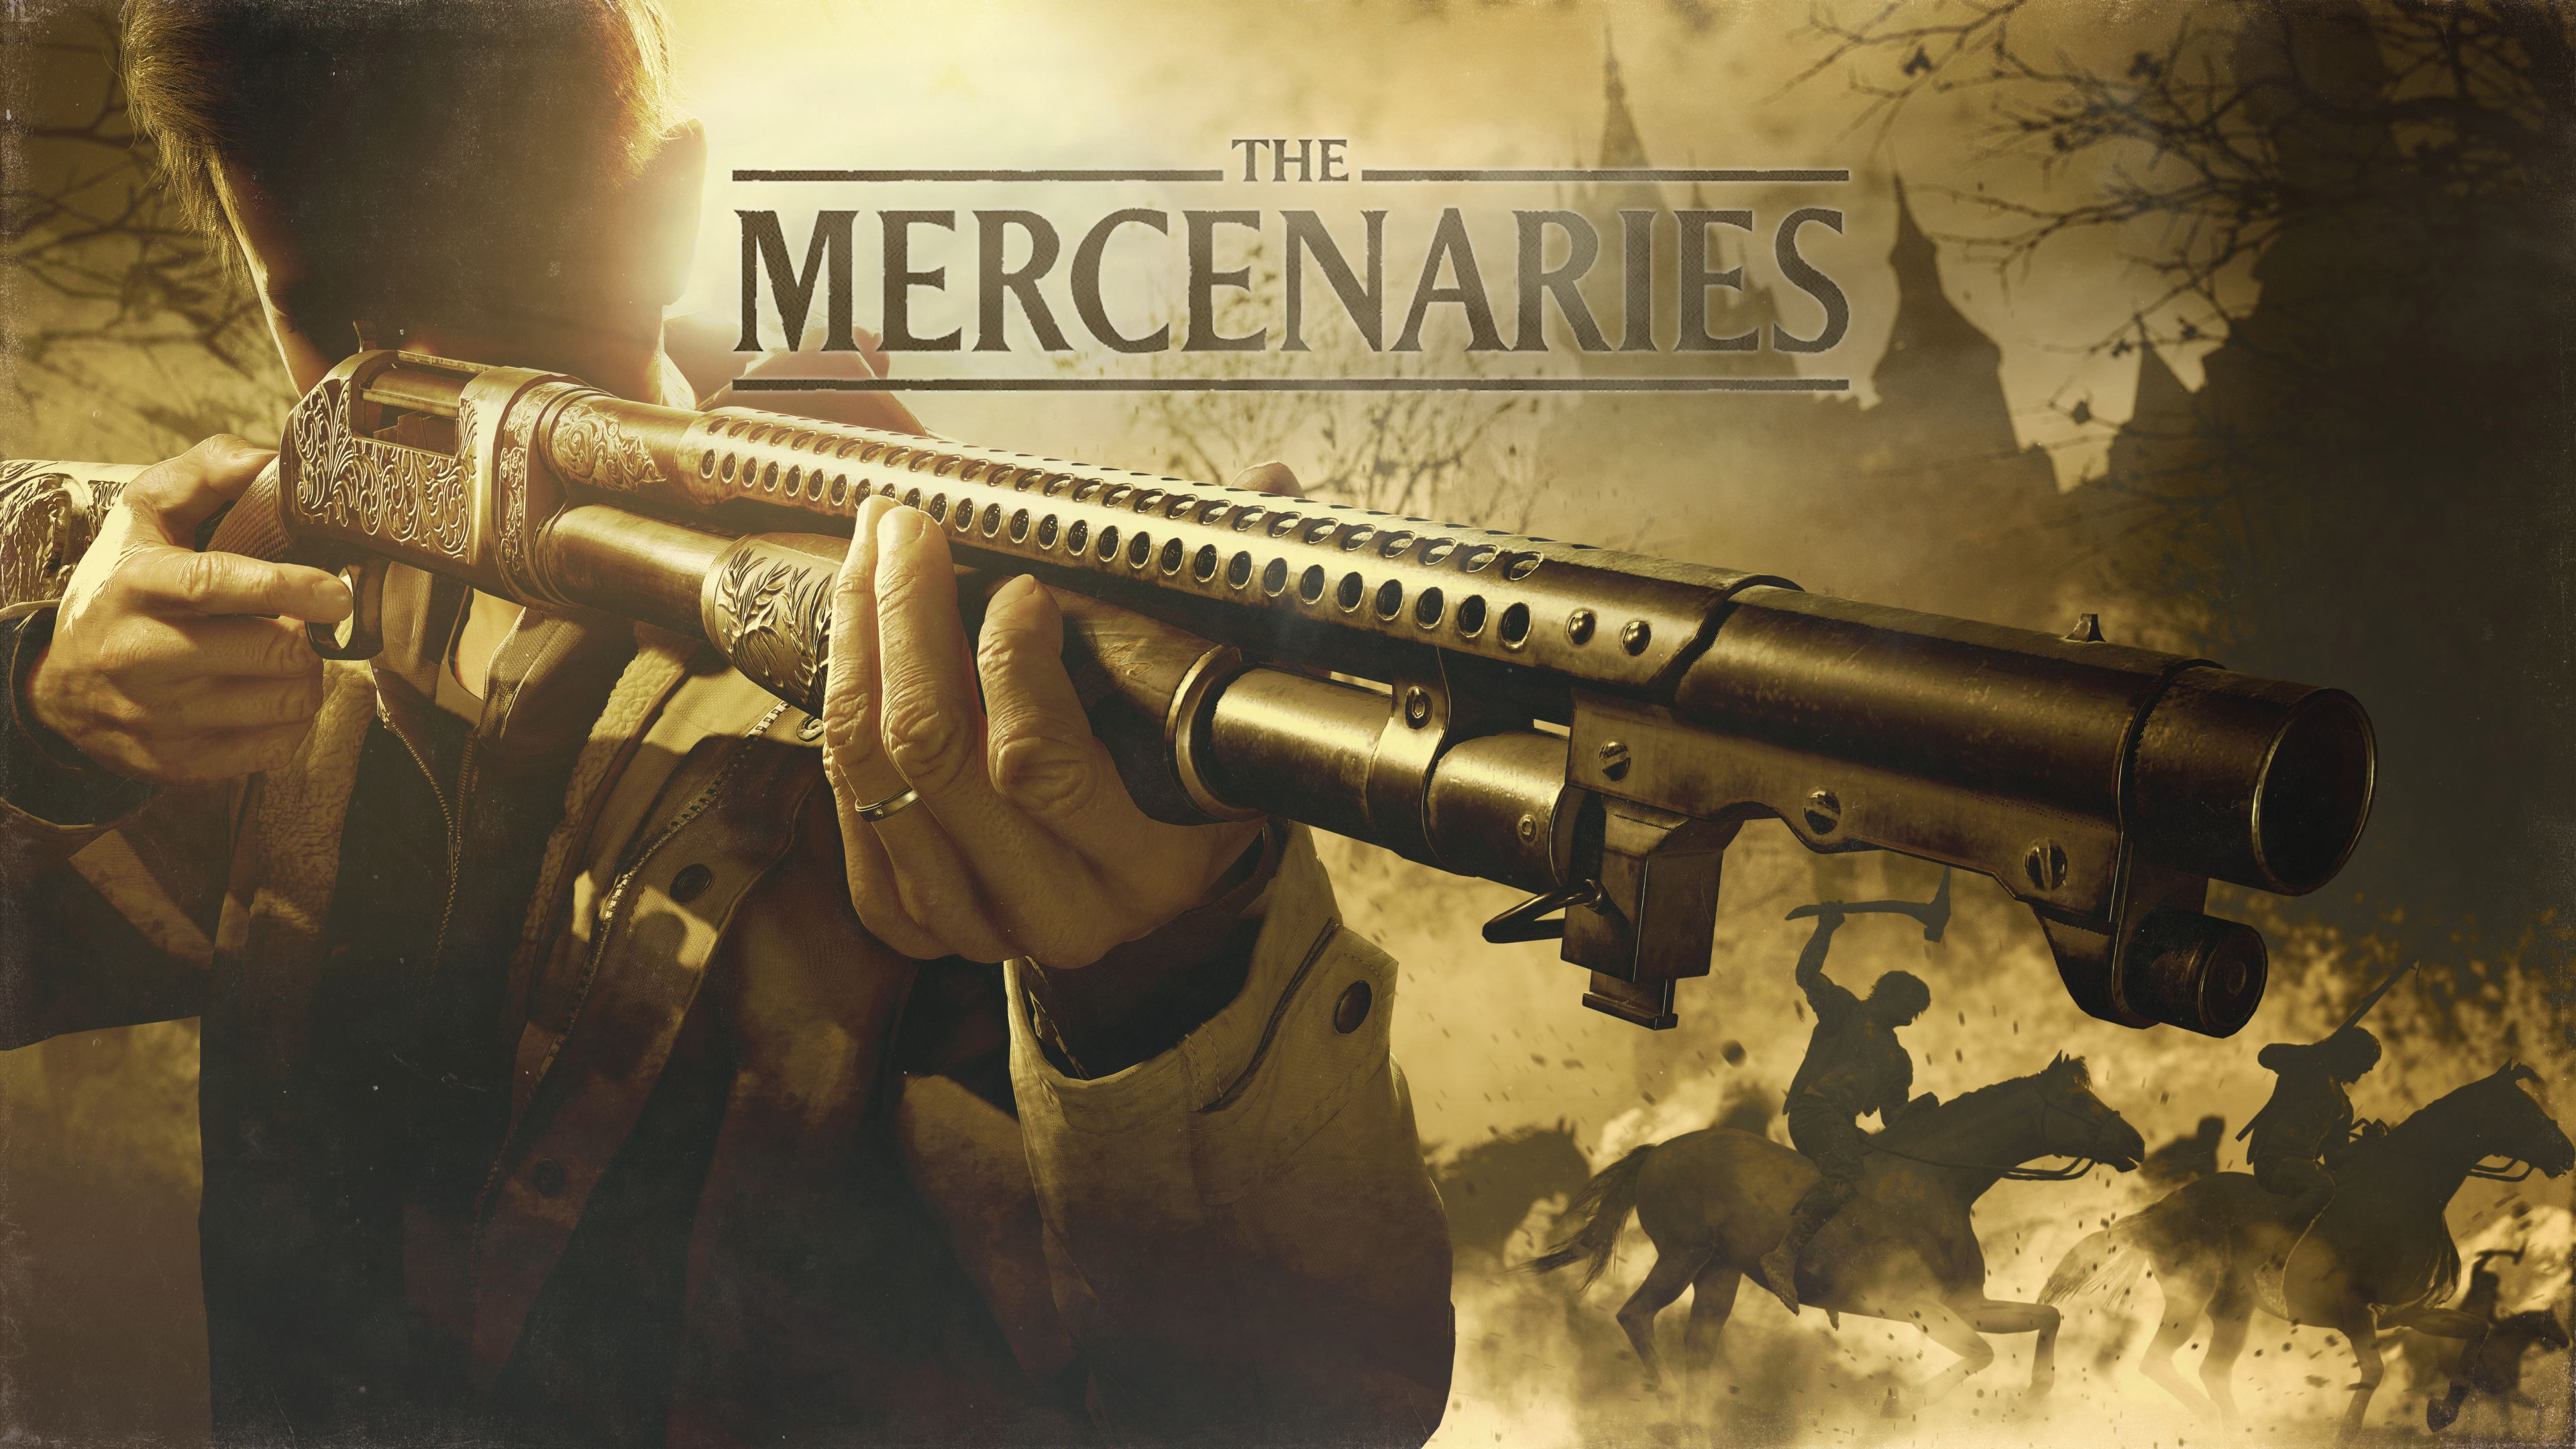 Capcom listened and The Mercenaries is back for Resident Evil Village screenshot